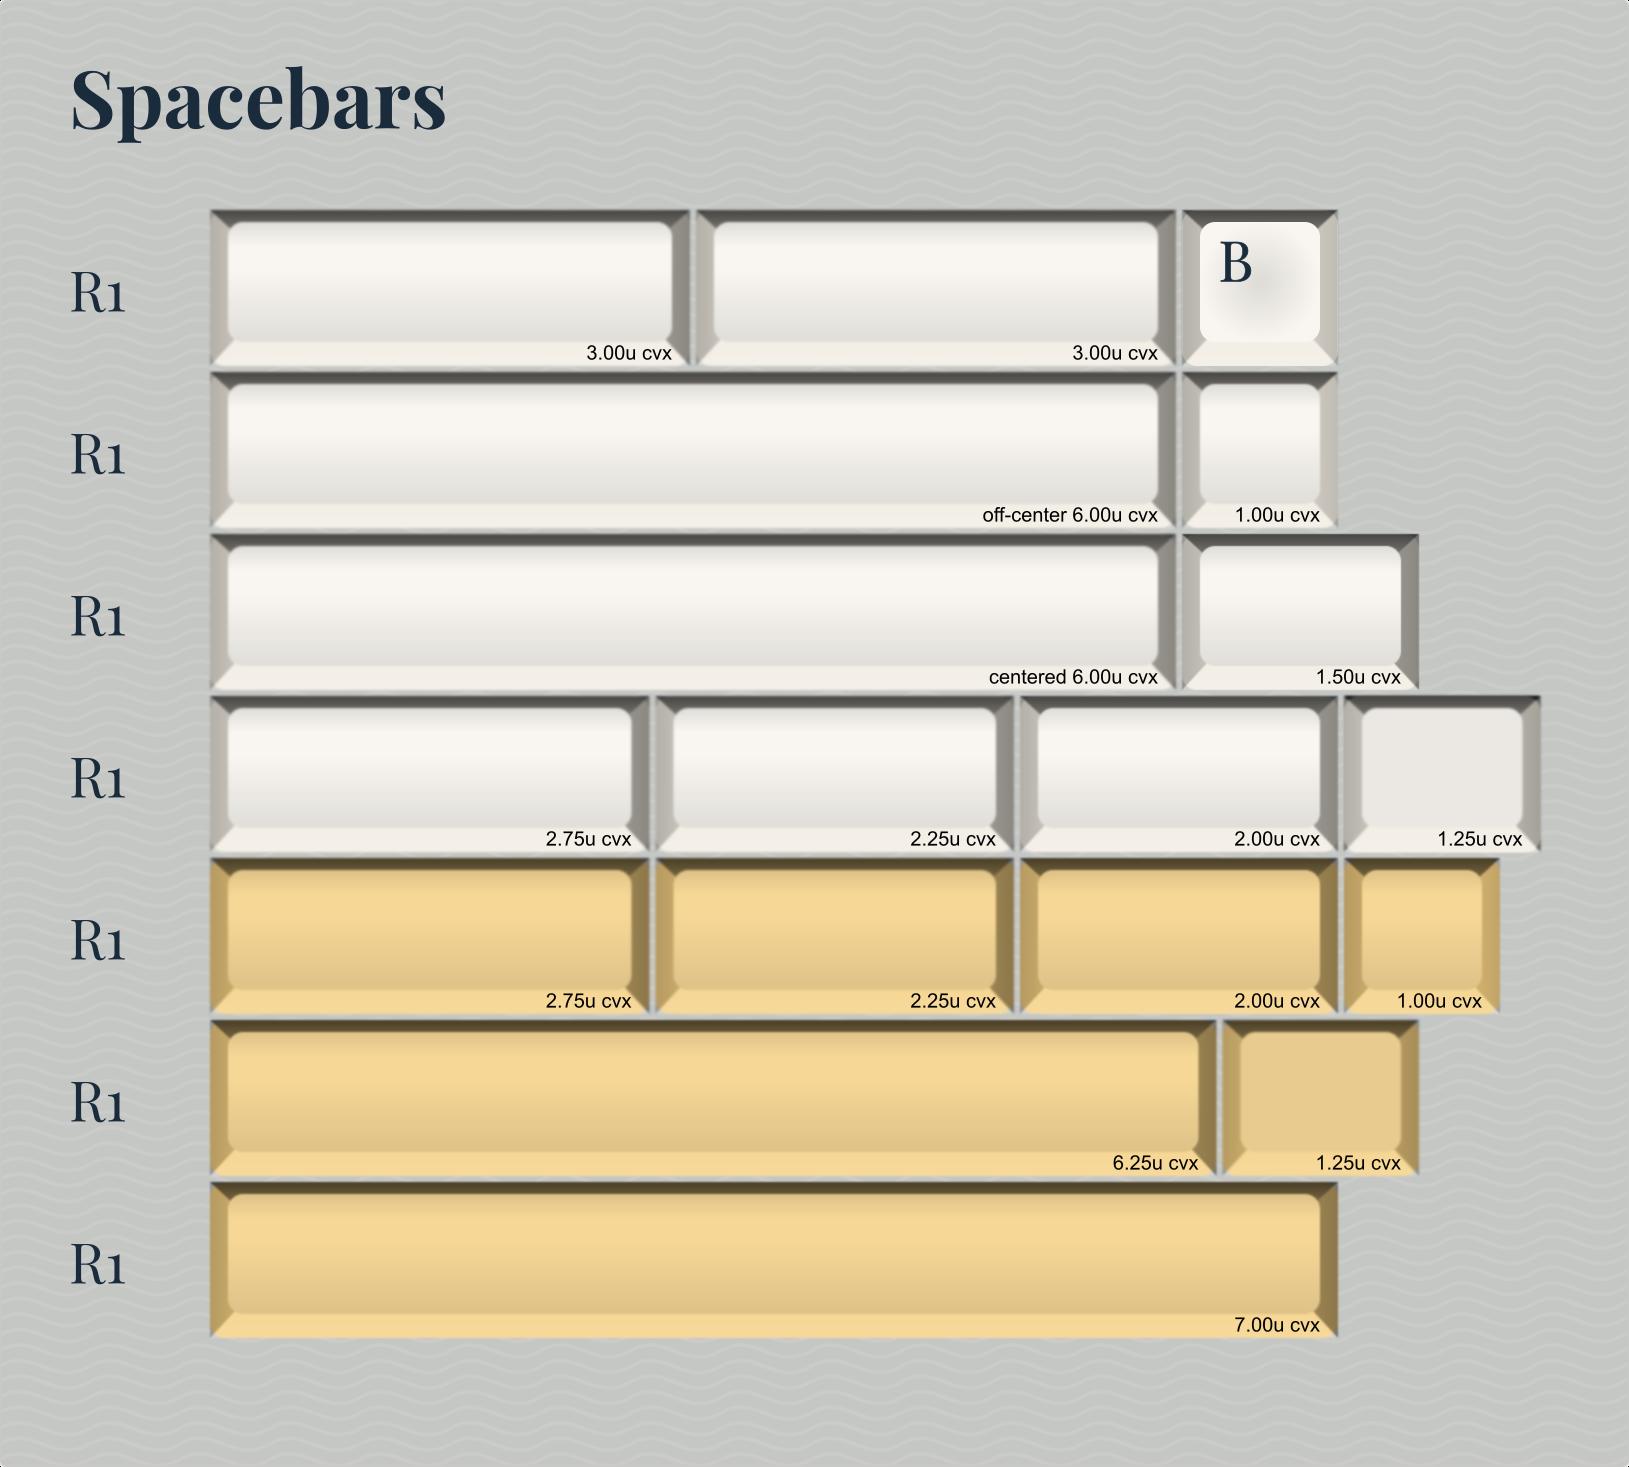 Spacebars